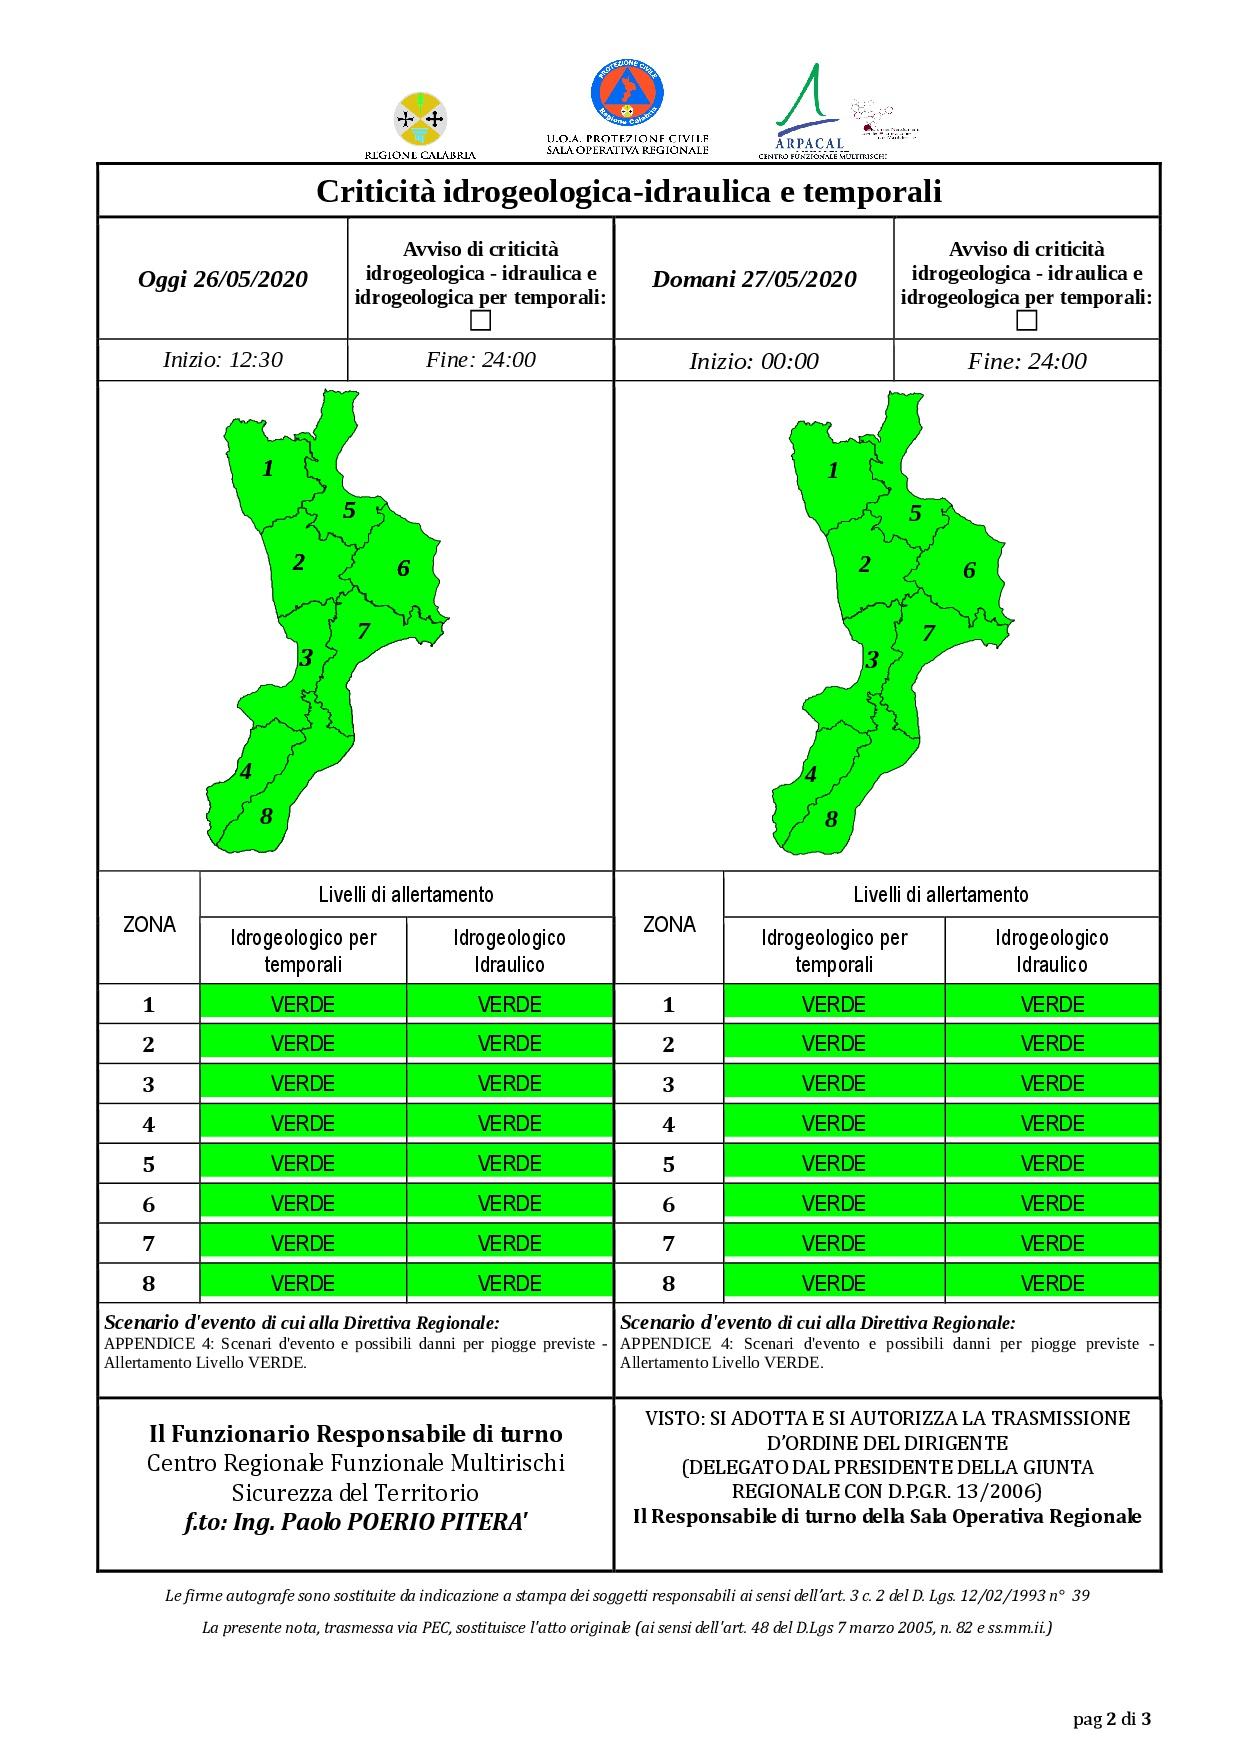 Criticità idrogeologica-idraulica e temporali in Calabria 26-05-2020